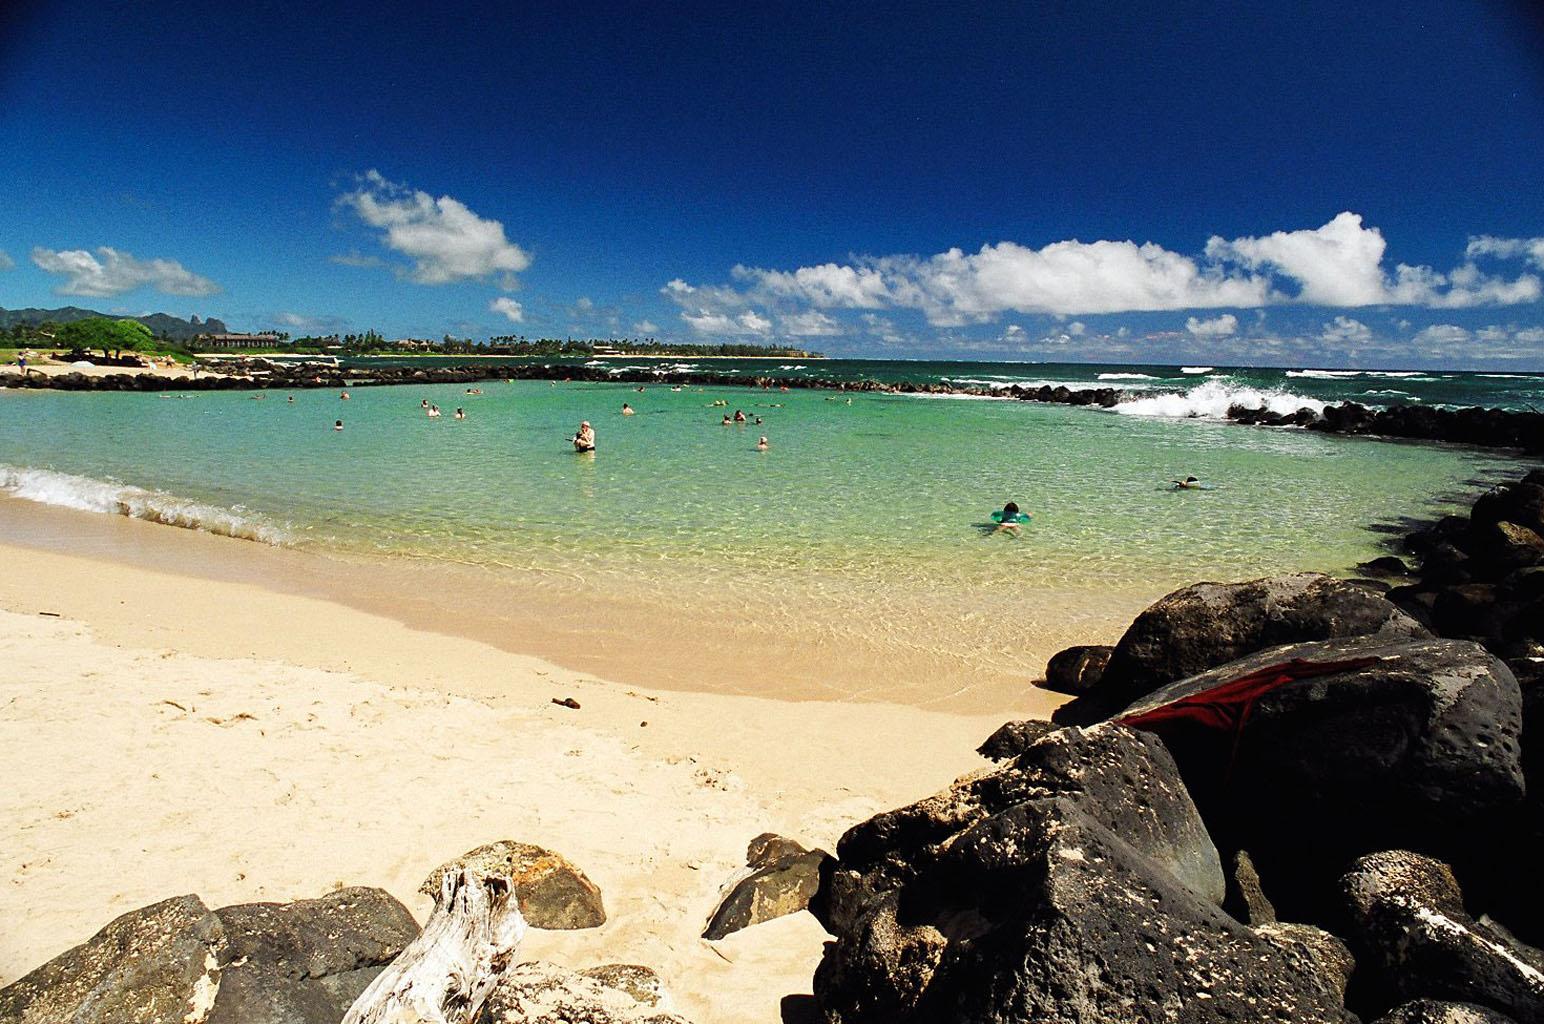 Lydgate_Beach,_Kauai,_Hawaii